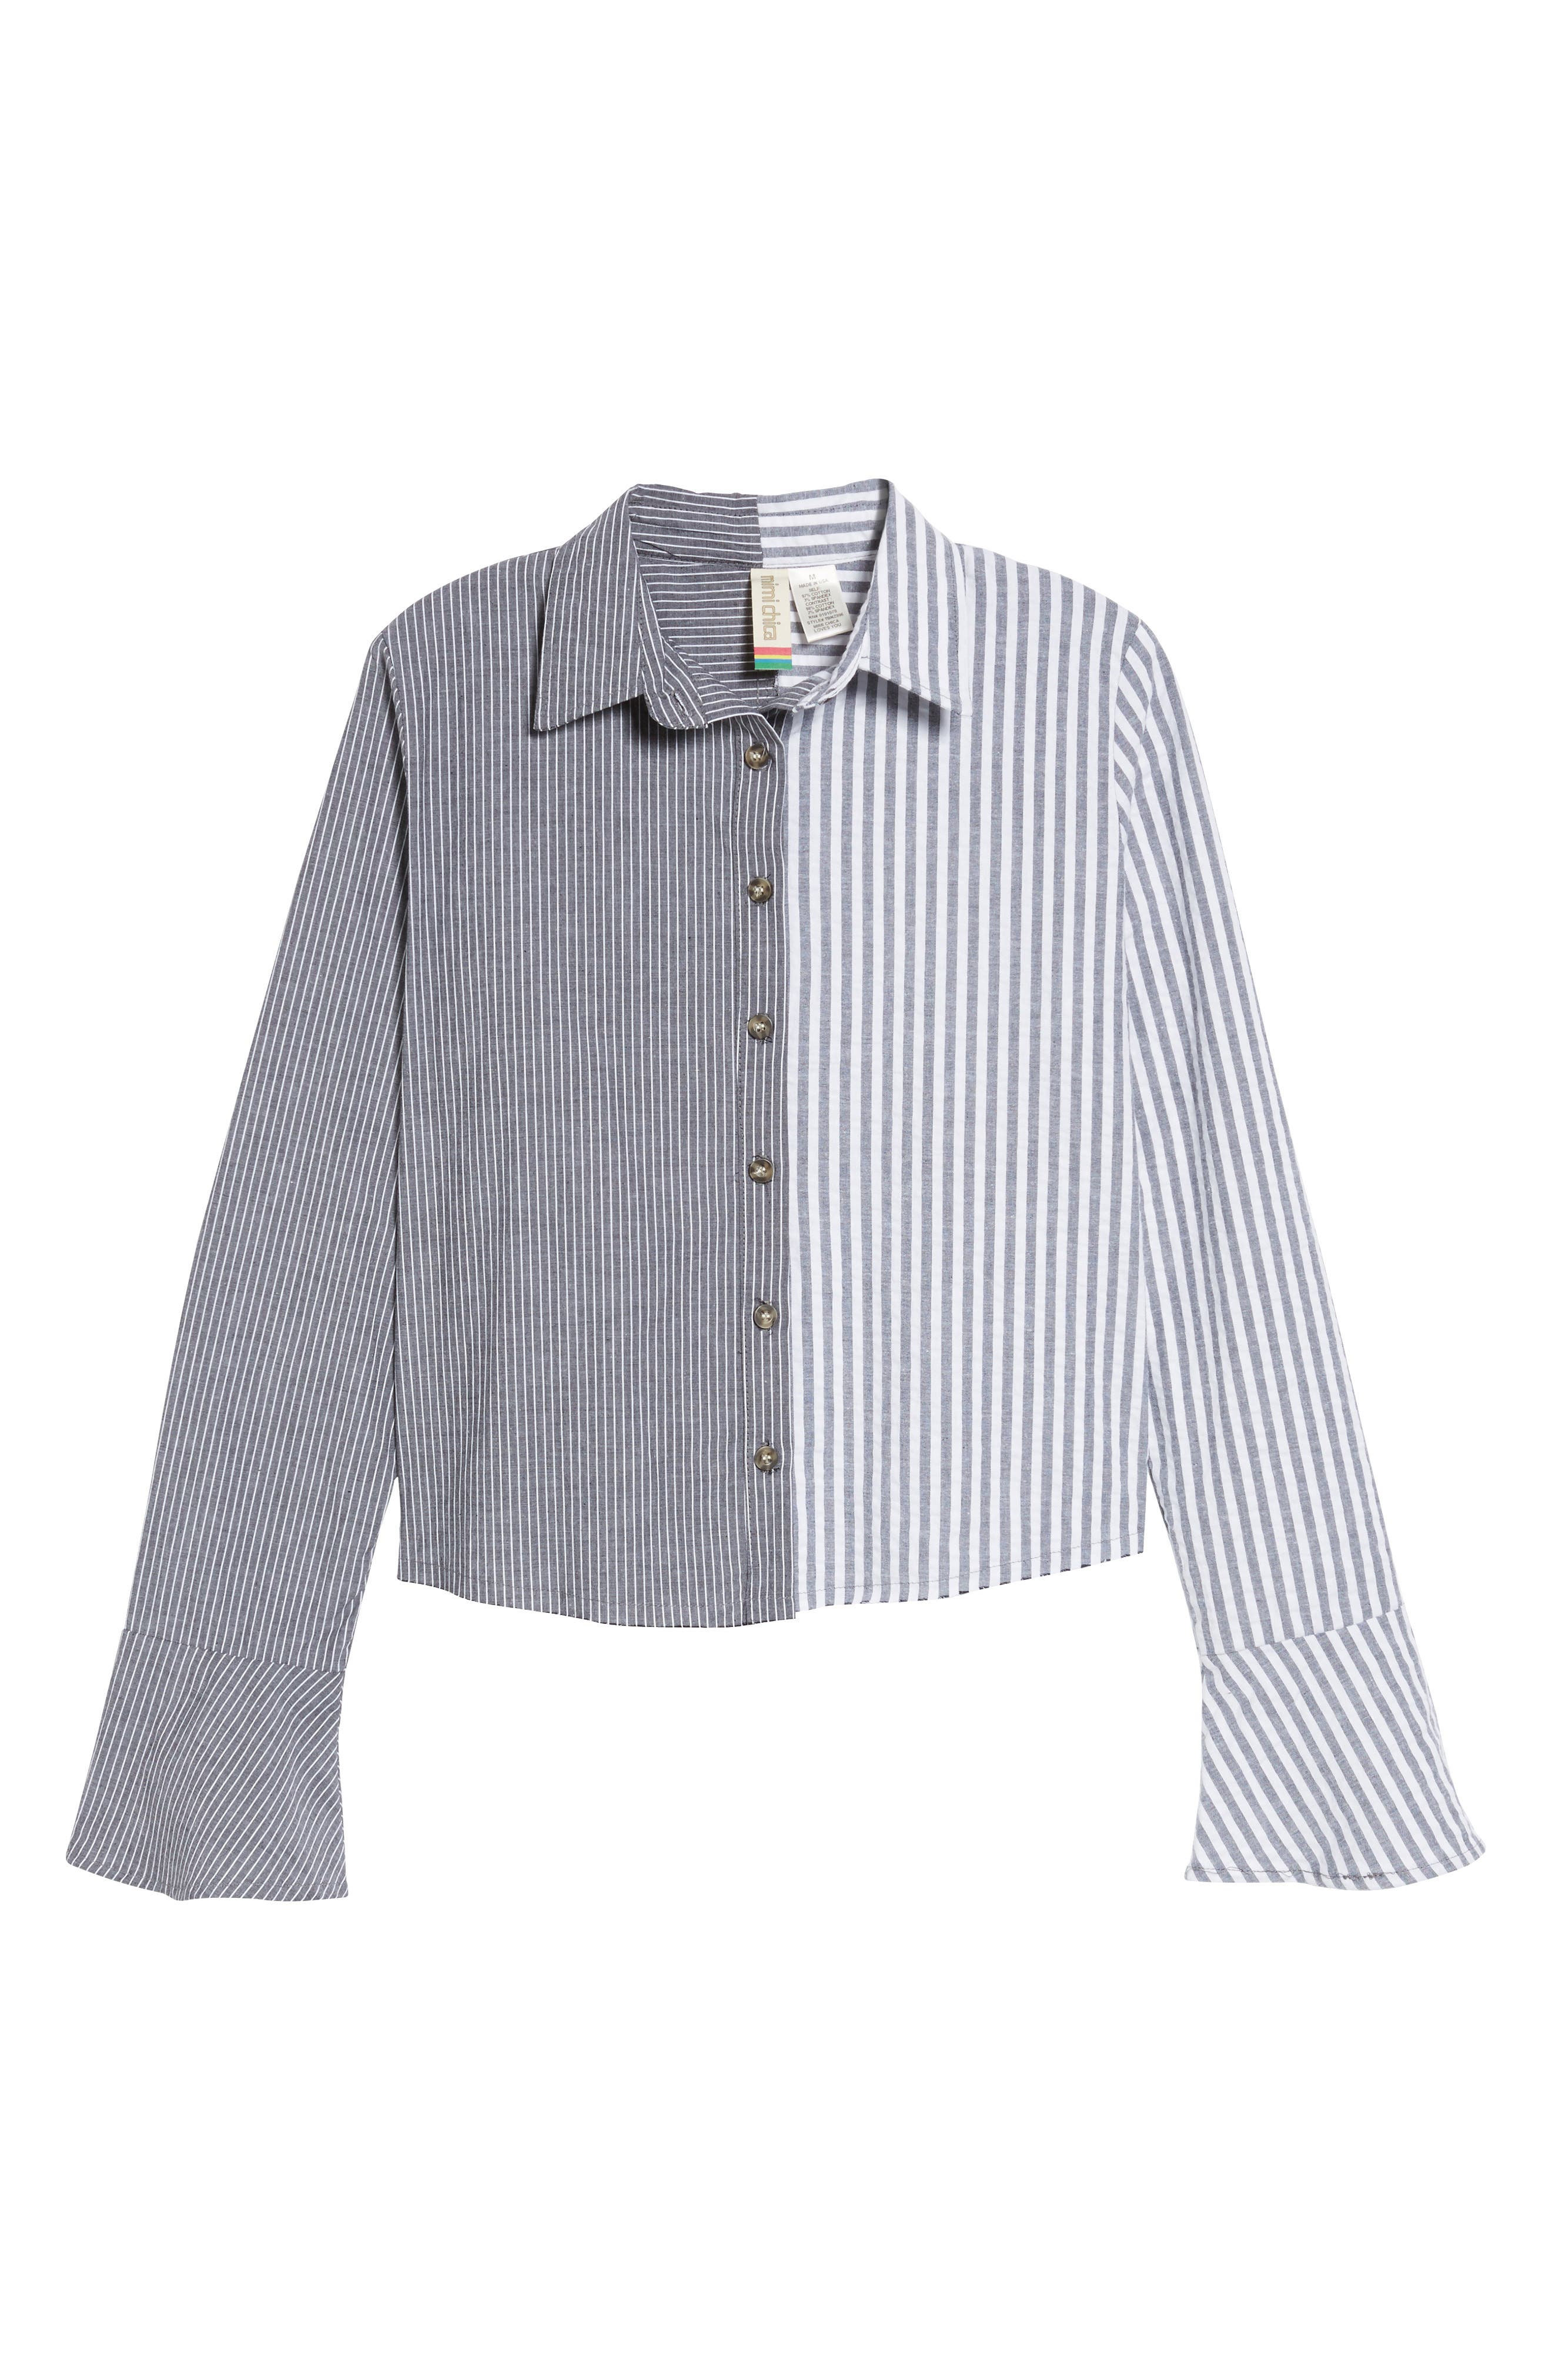 Mismatch Stripe Shirt,                             Alternate thumbnail 6, color,                             Stripe